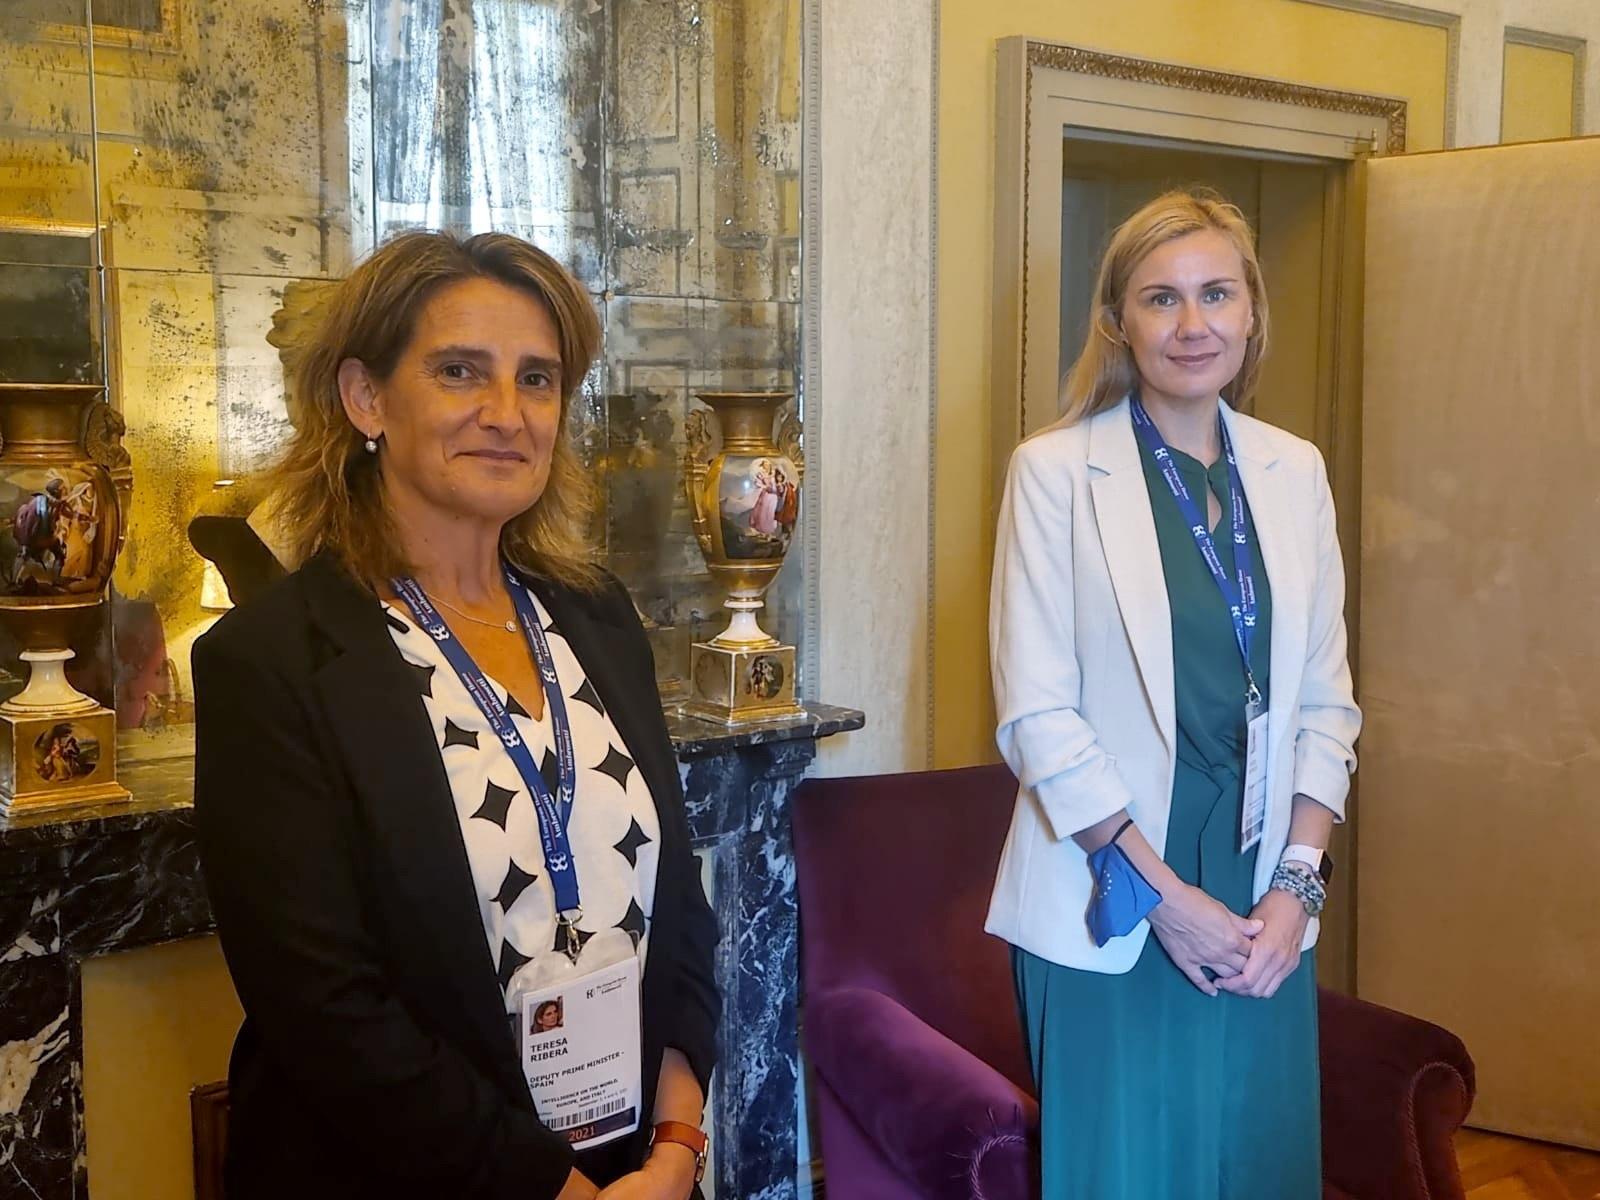 La vicepresidenta tercera, Teresa  Ribera, durante su reunión bilateral con la comisaria europea de Energía, Kadri Simson, celebrada este sábado en el norte de Italia.